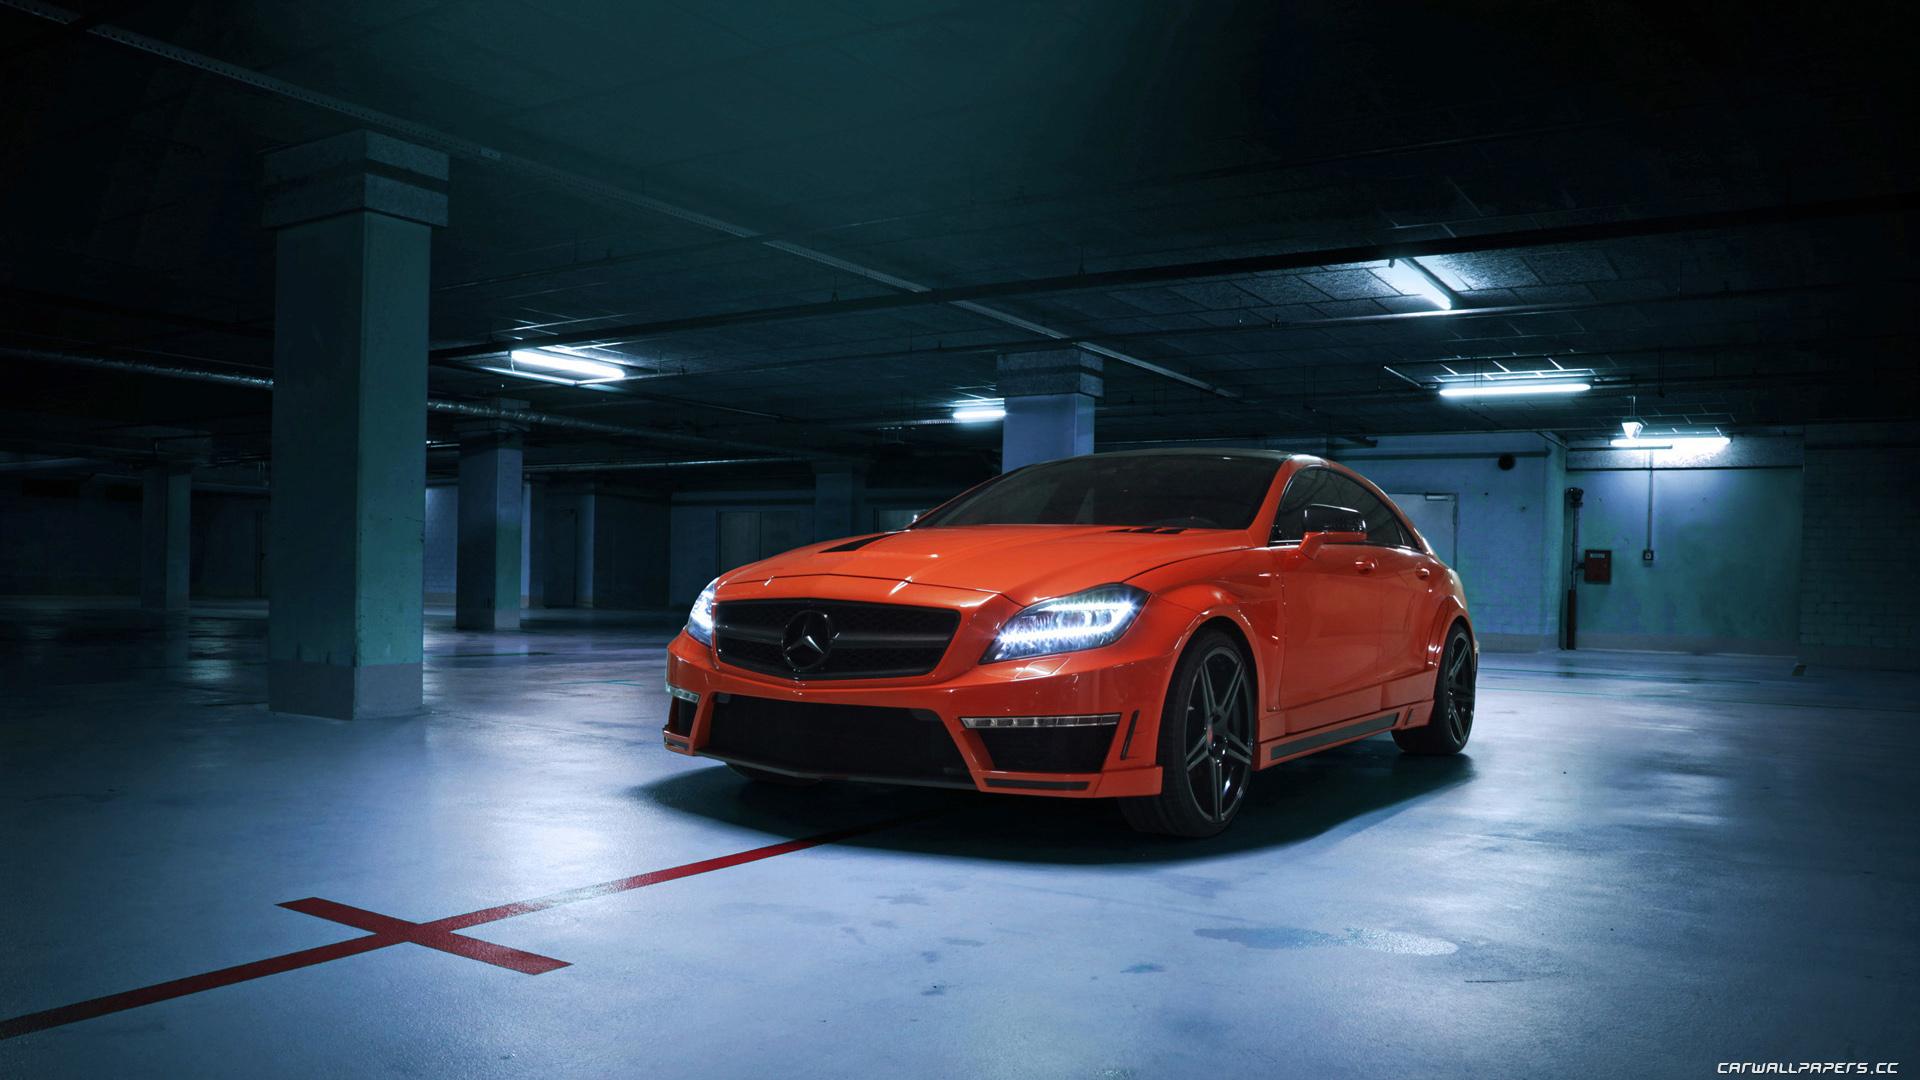 Car Mercedes-Benz CLS 63 AMG Tuning